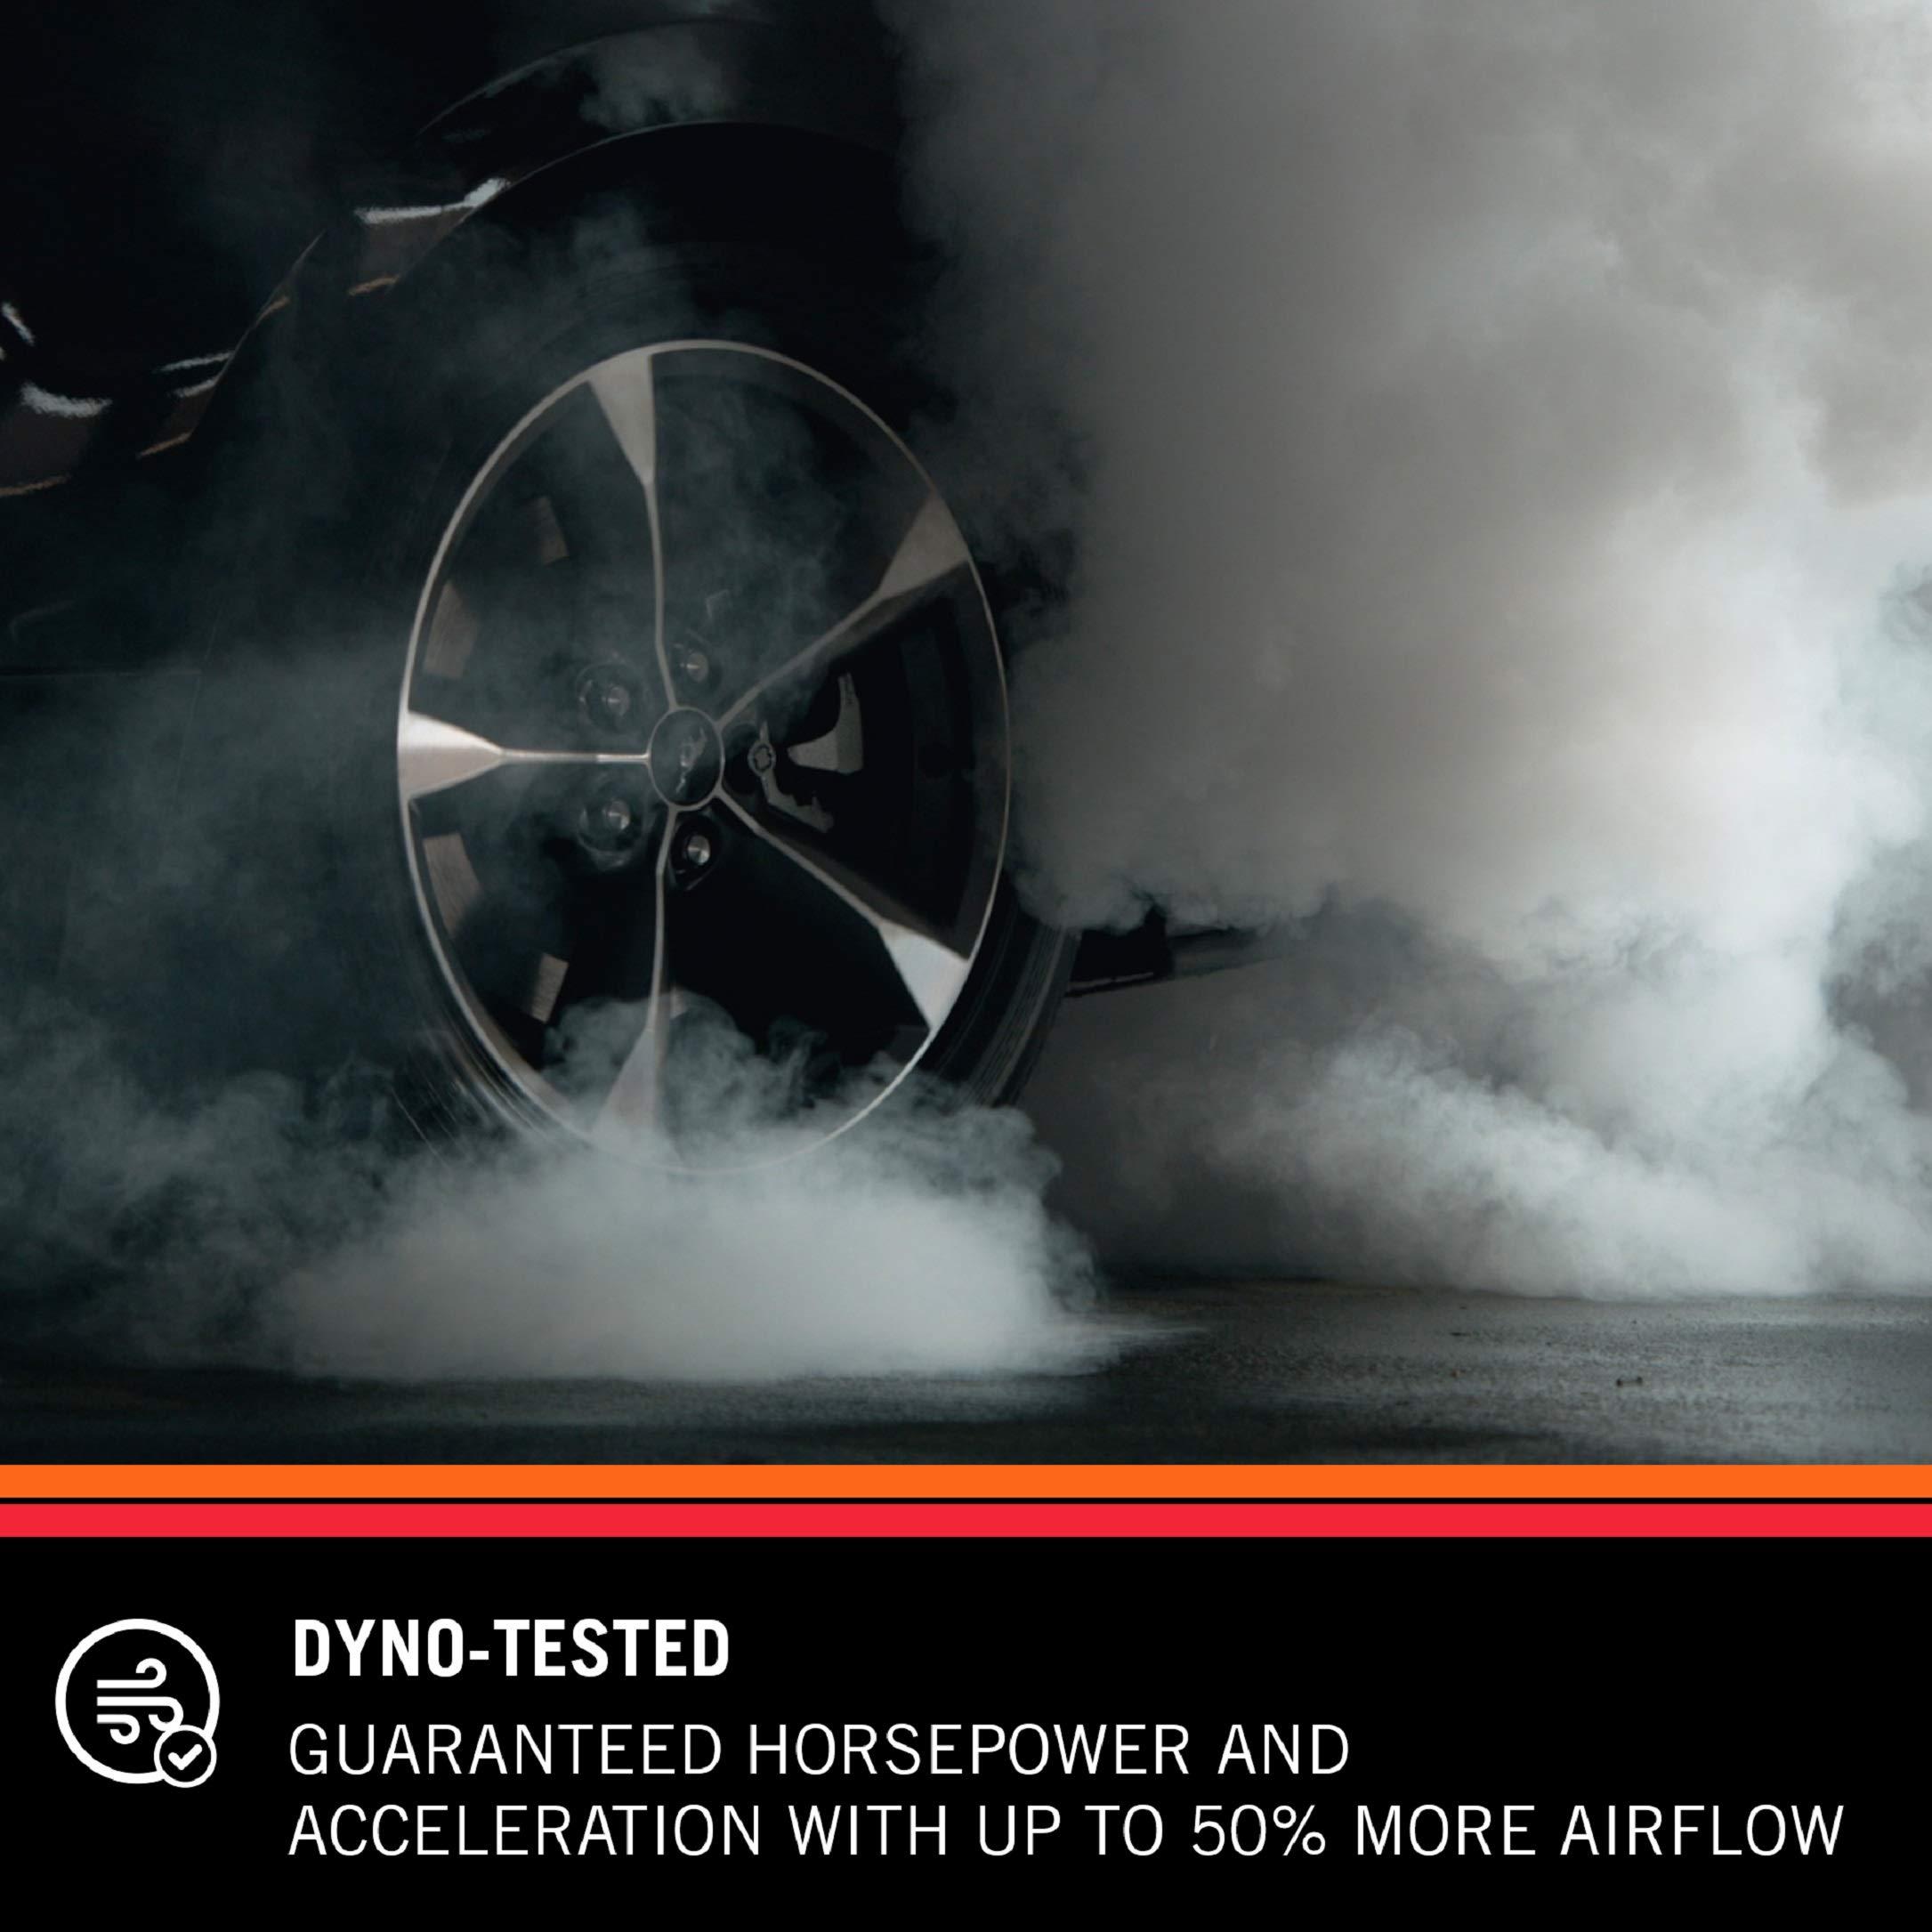 K&N Cold Air Intake Kit: High Performance, Increase Horsepower: Compatible with 2014-2020 Chevy/GMC/Cadillac (Silverado 1500, Suburban, Tahoe, Sierra 1500, Yukon, Yukon Denali, Escalade) V8,63-3082